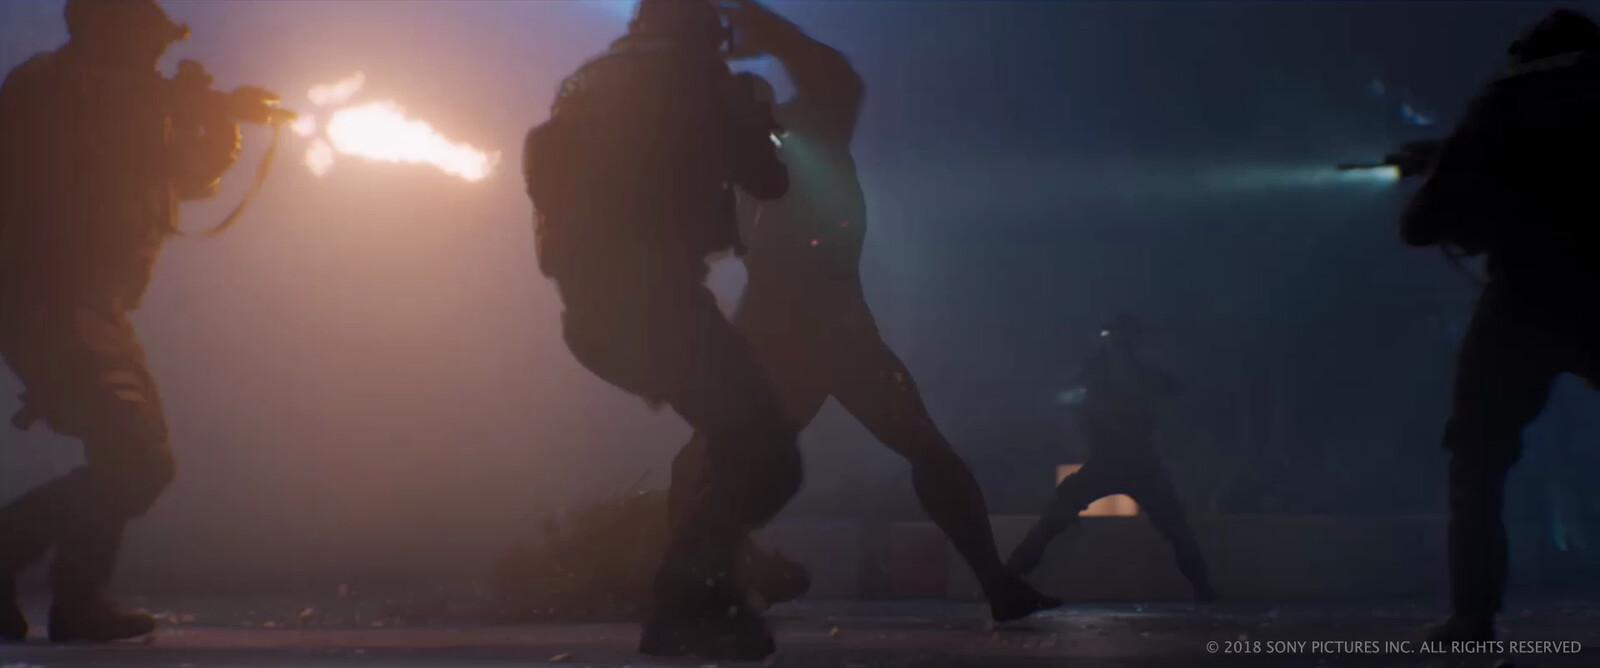 SWAT team digi doubles - model, texture, lookdev